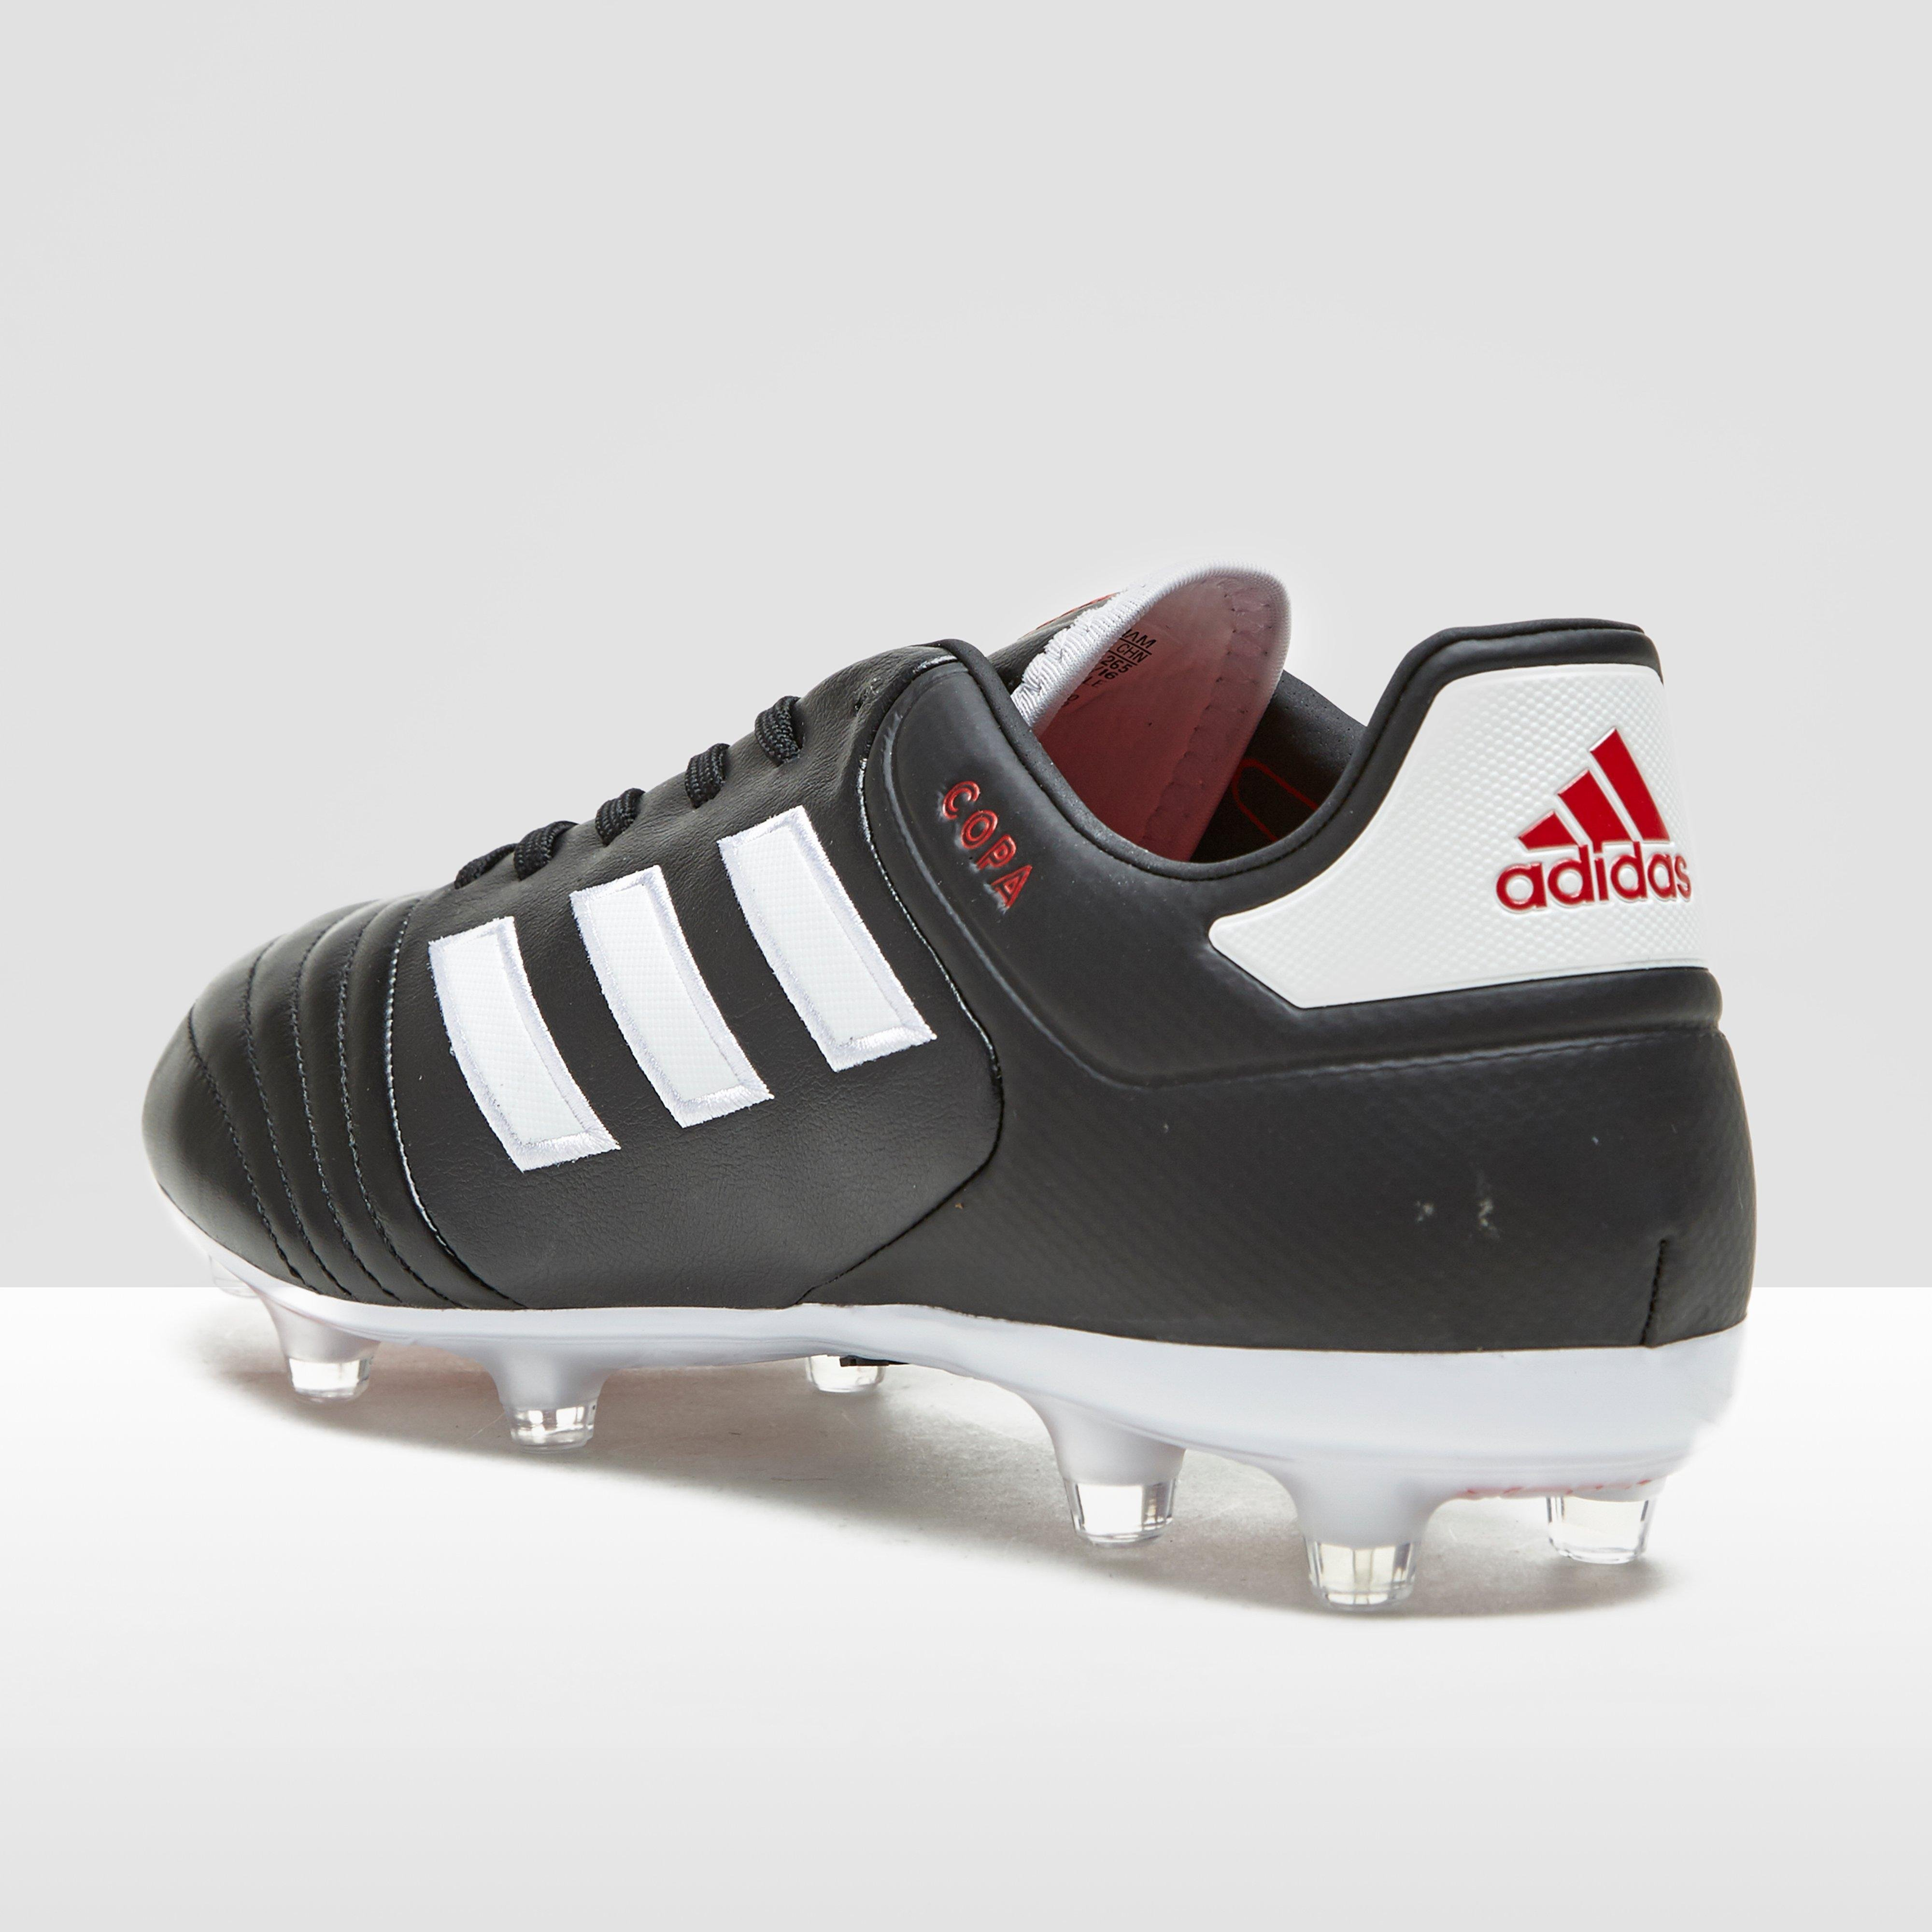 Adidas Copa 17,2 Fg Football